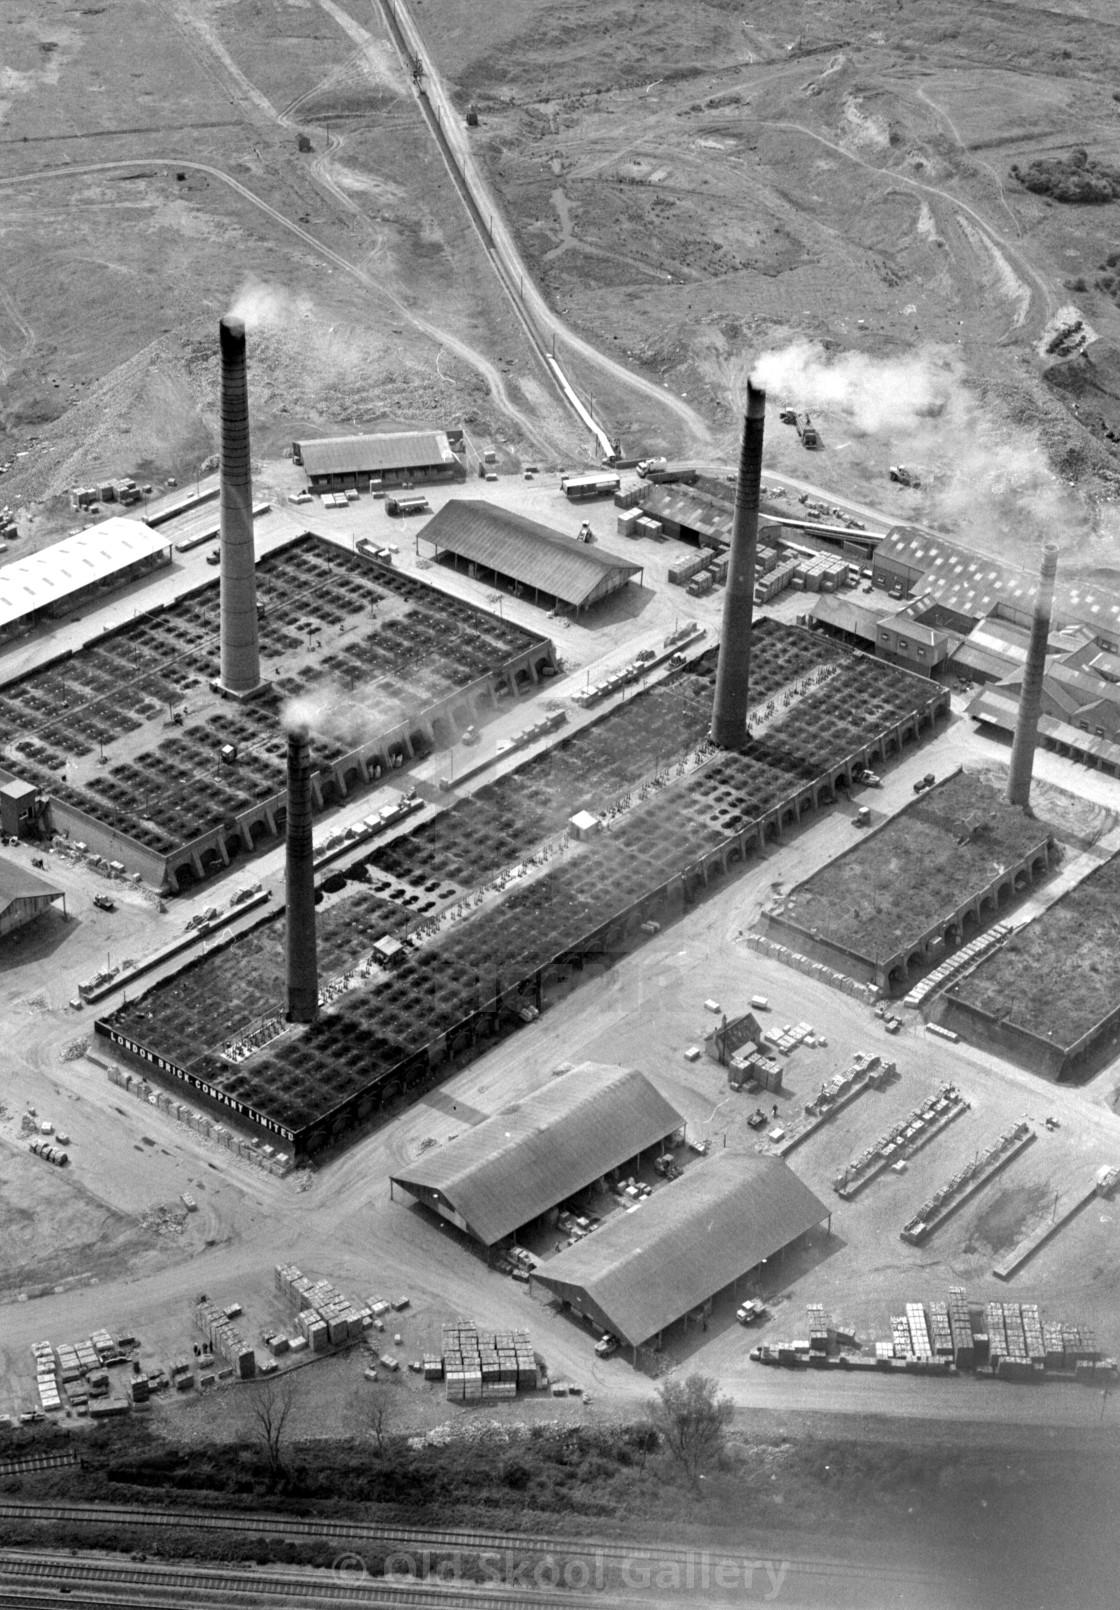 Beebys Brickworks, Yaxley (1982)